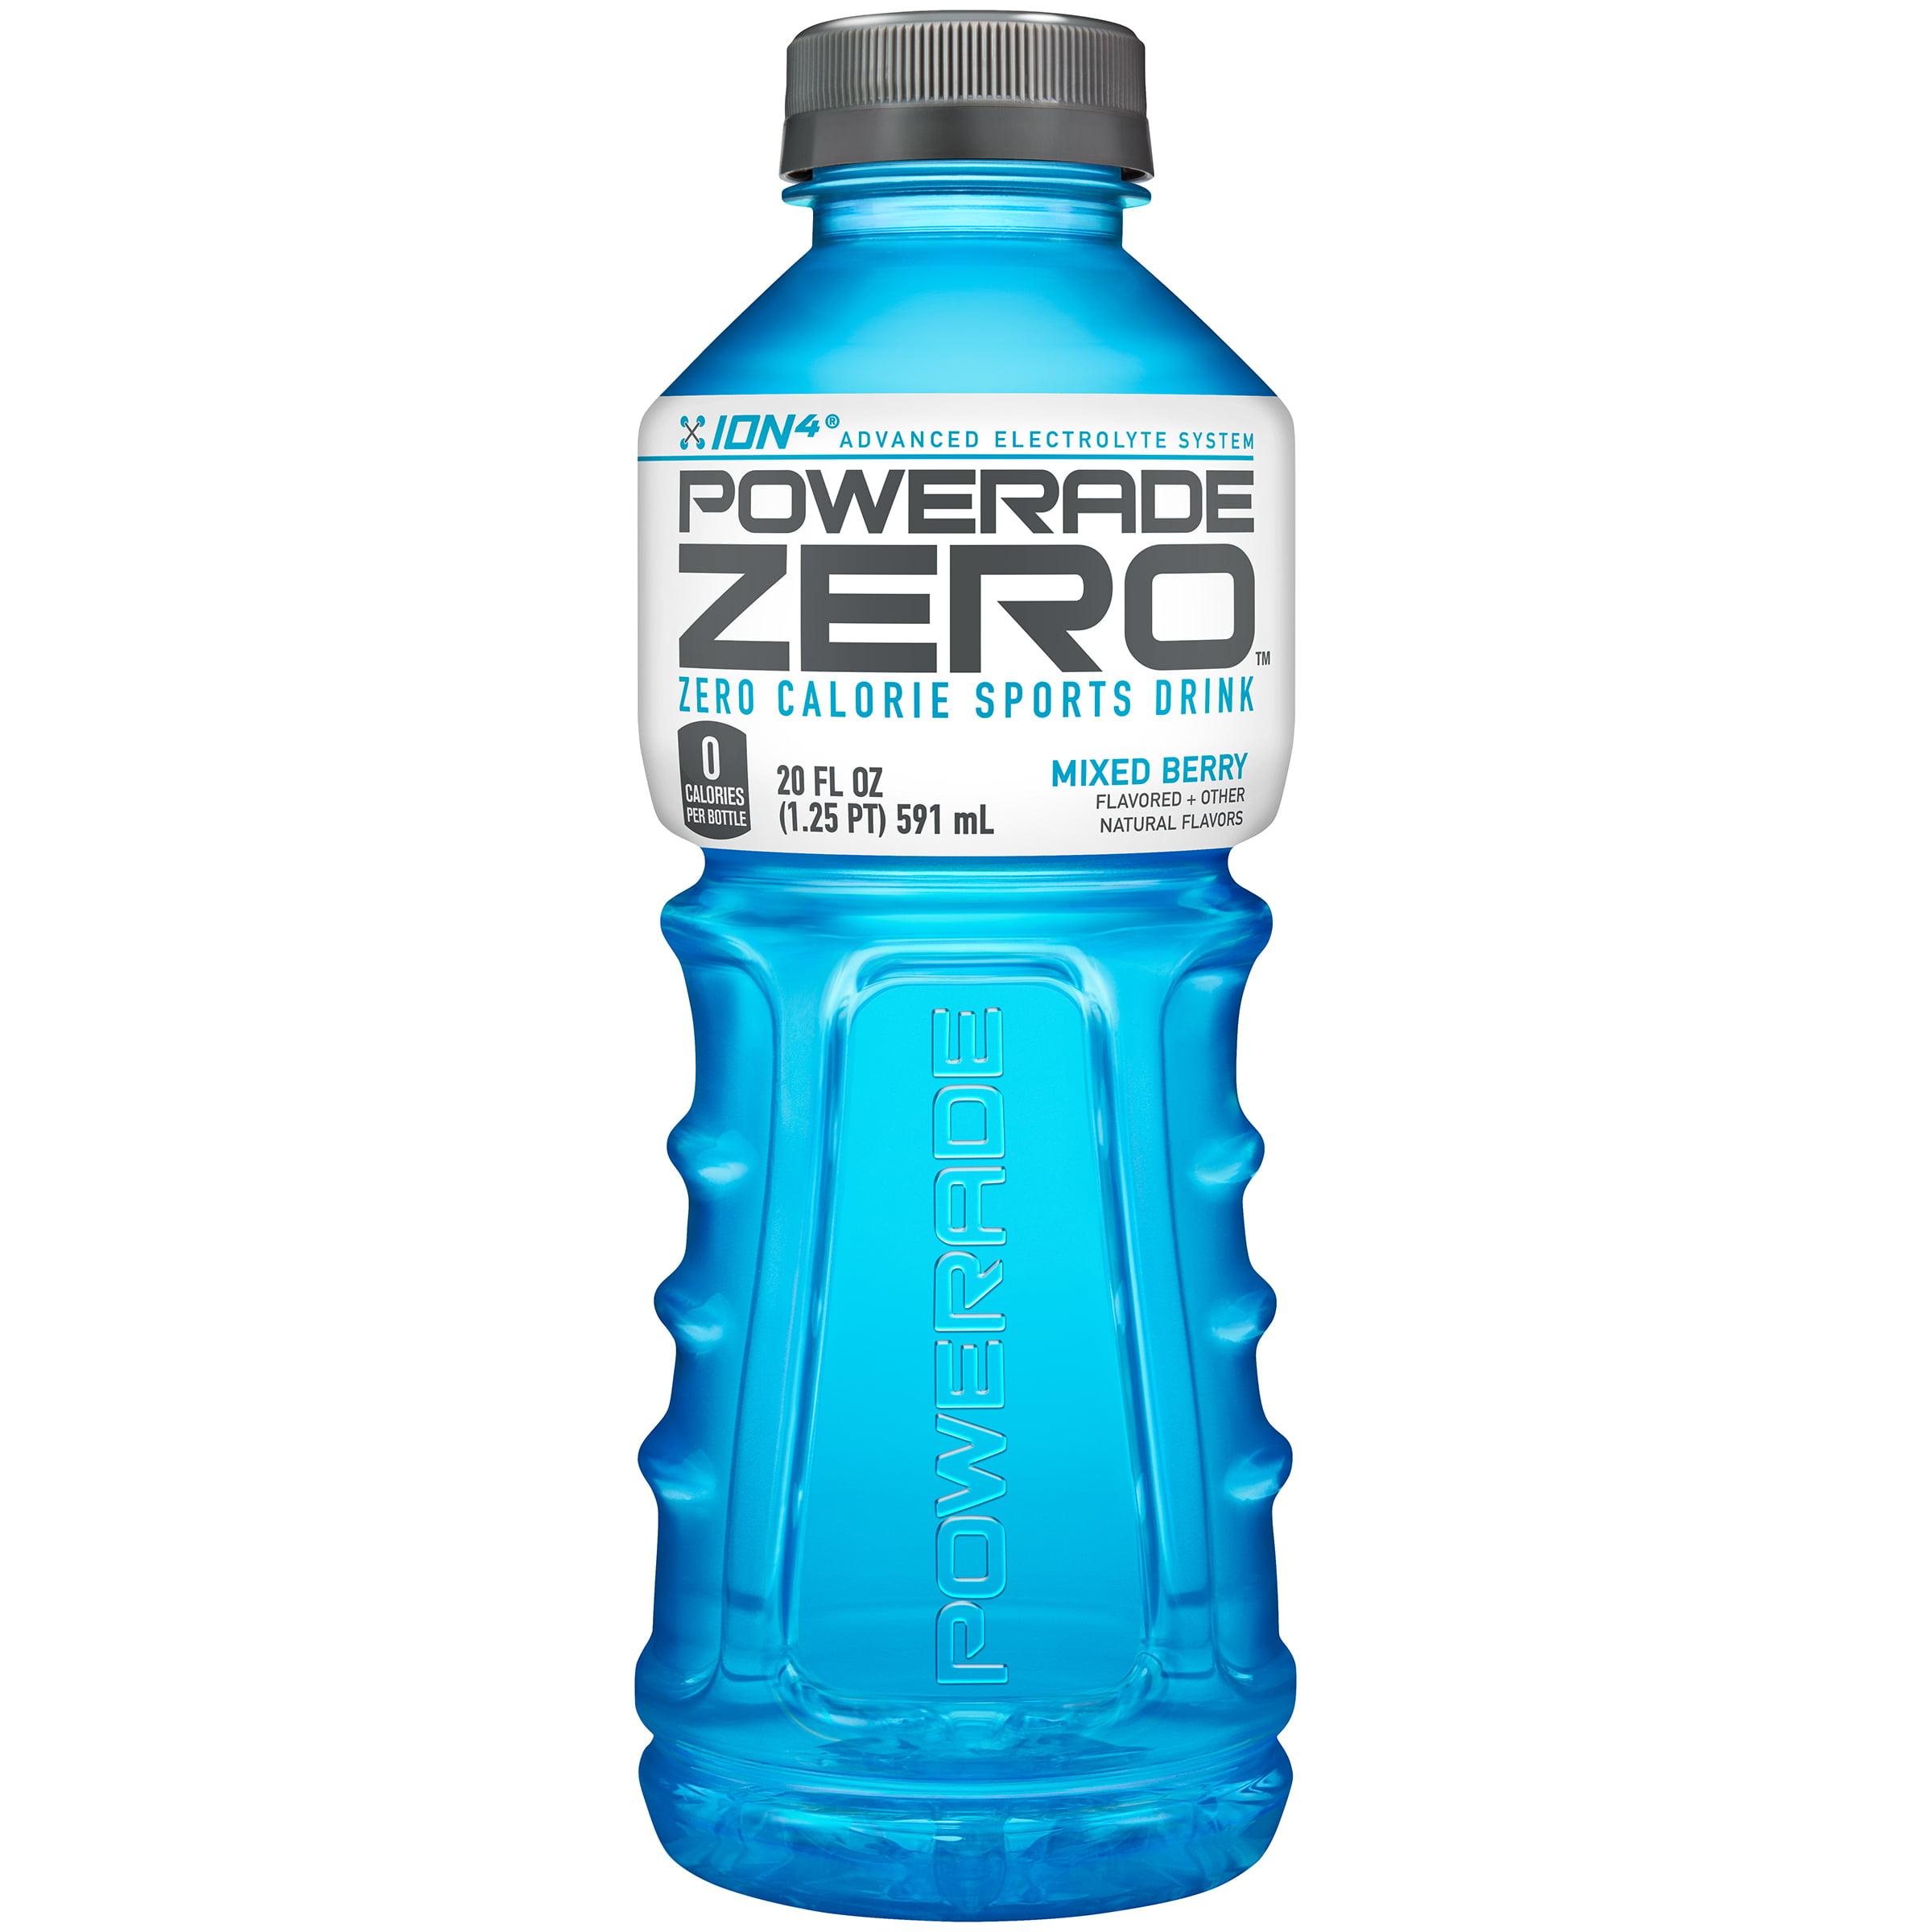 POWERADE ZERO Sports Drink, Mixed Berry, 20 Fl Oz, 24 Ct